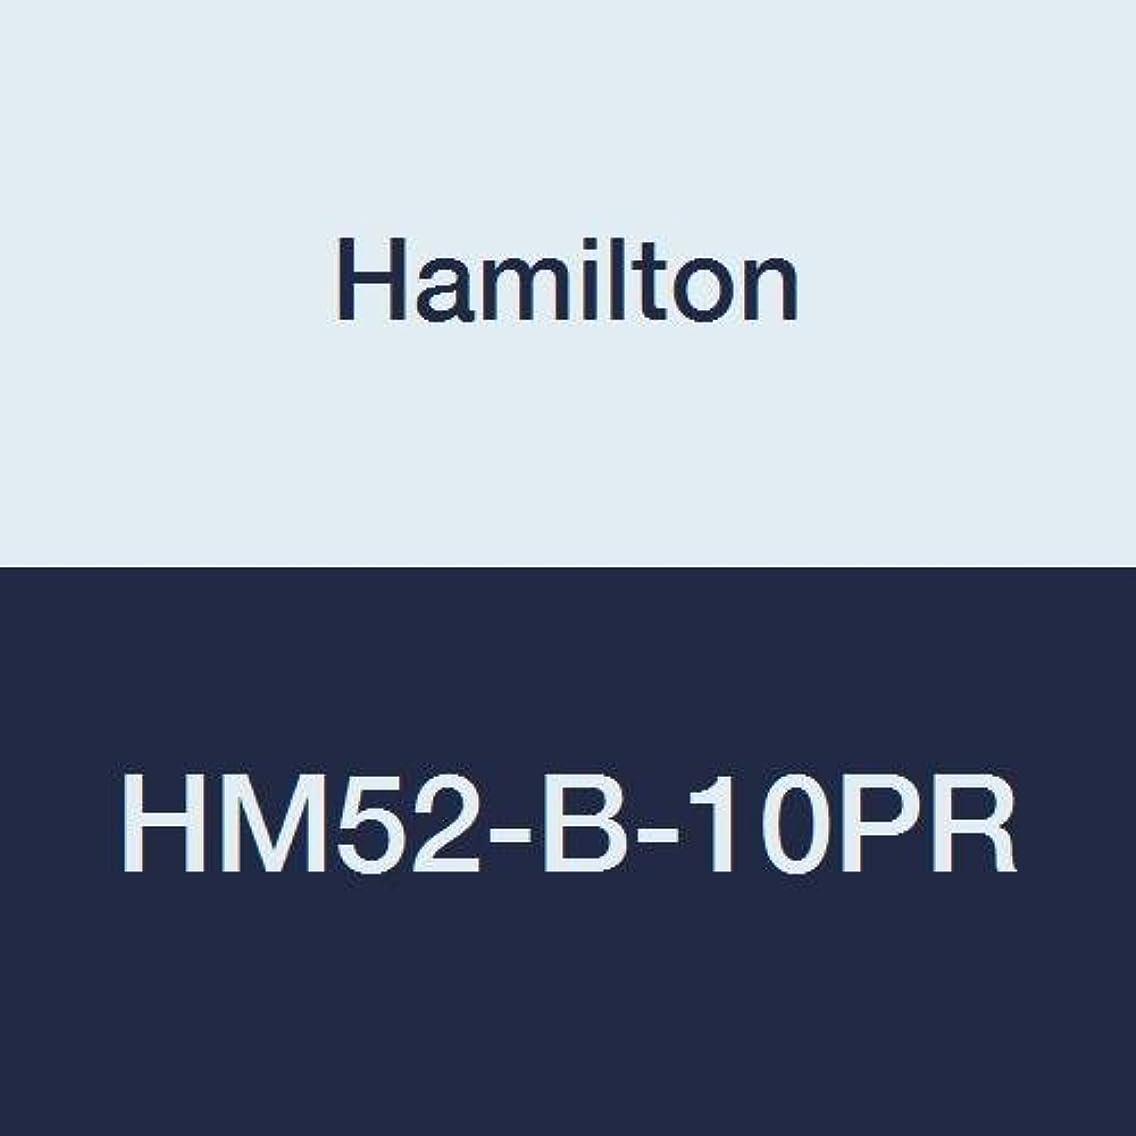 Hamilton HM52-B-10PR Hand Truck 15X46 Steel 10PR 500